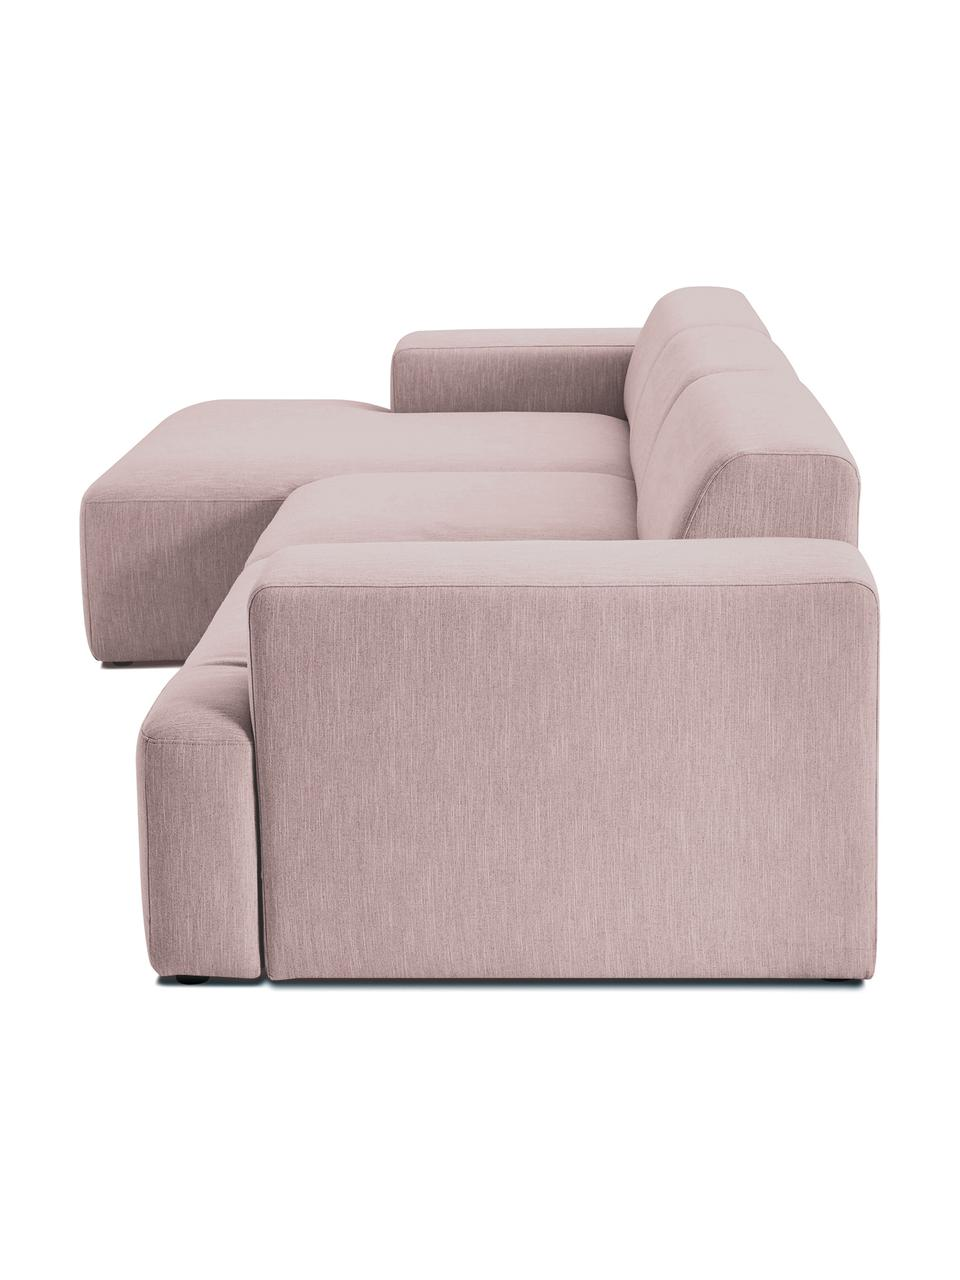 Hoekbank Melva (4-zits) in roze, Bekleding: polyester, Frame: massief grenenhout, spaan, Poten: grenenhout, Geweven stof roze, B 319 x D 144 cm